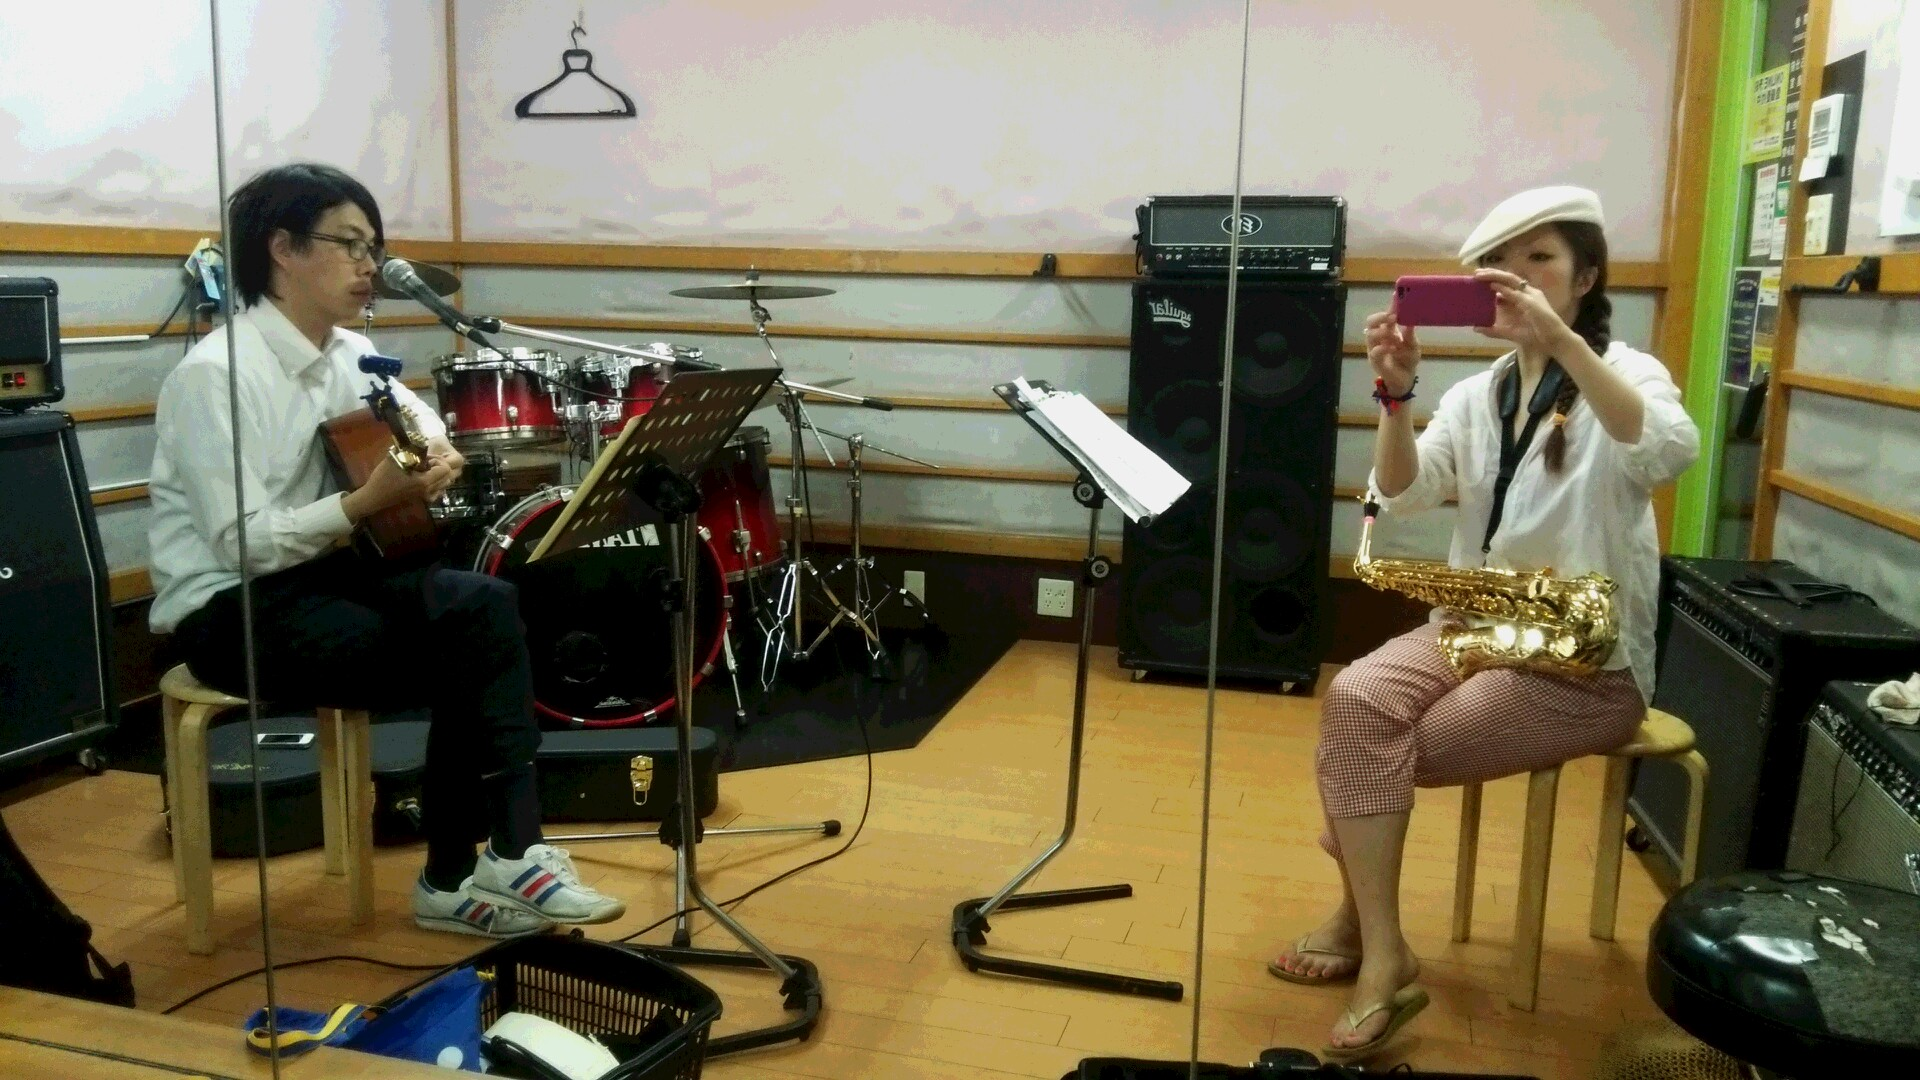 syunrai. 春雷ライブ★6/4(木)野毛ボーダーライン6/7(日)北浦和swing festival